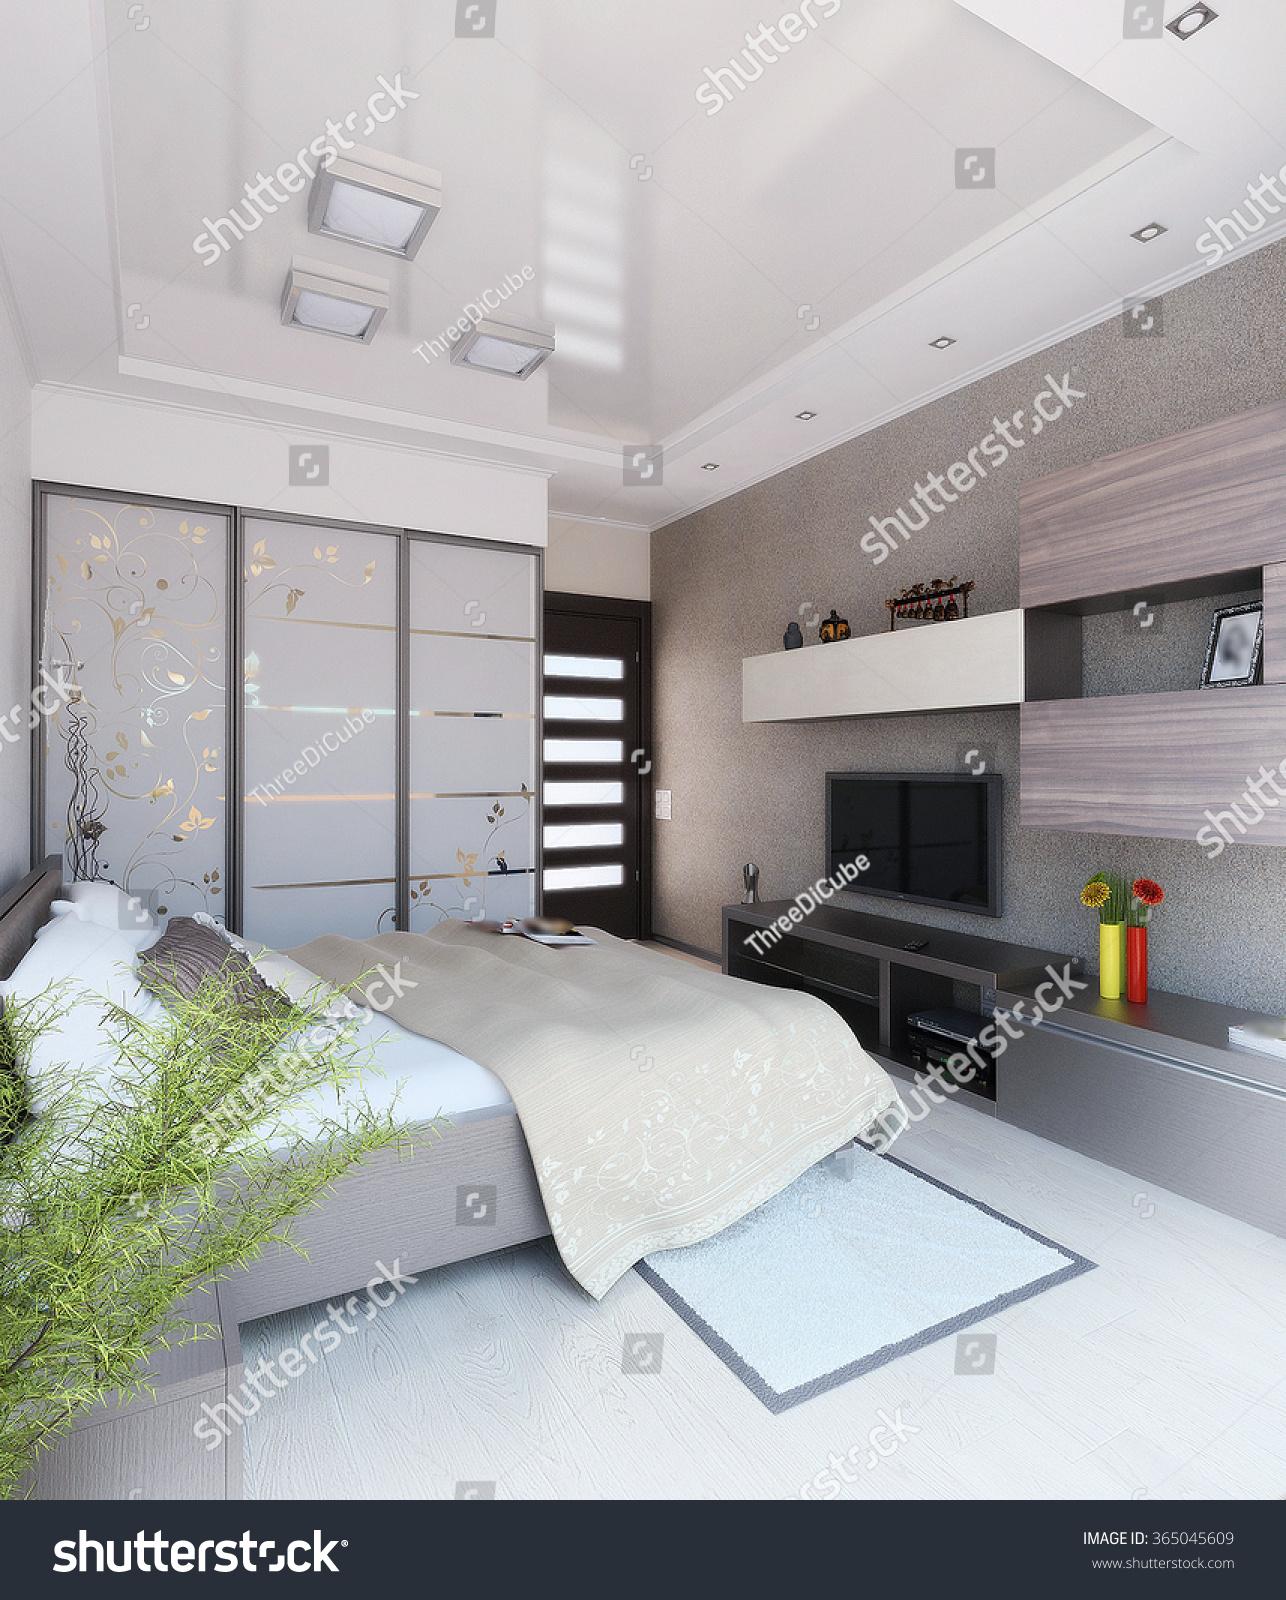 Modern Bedroom Interior Design, 3d Render Stock Photo